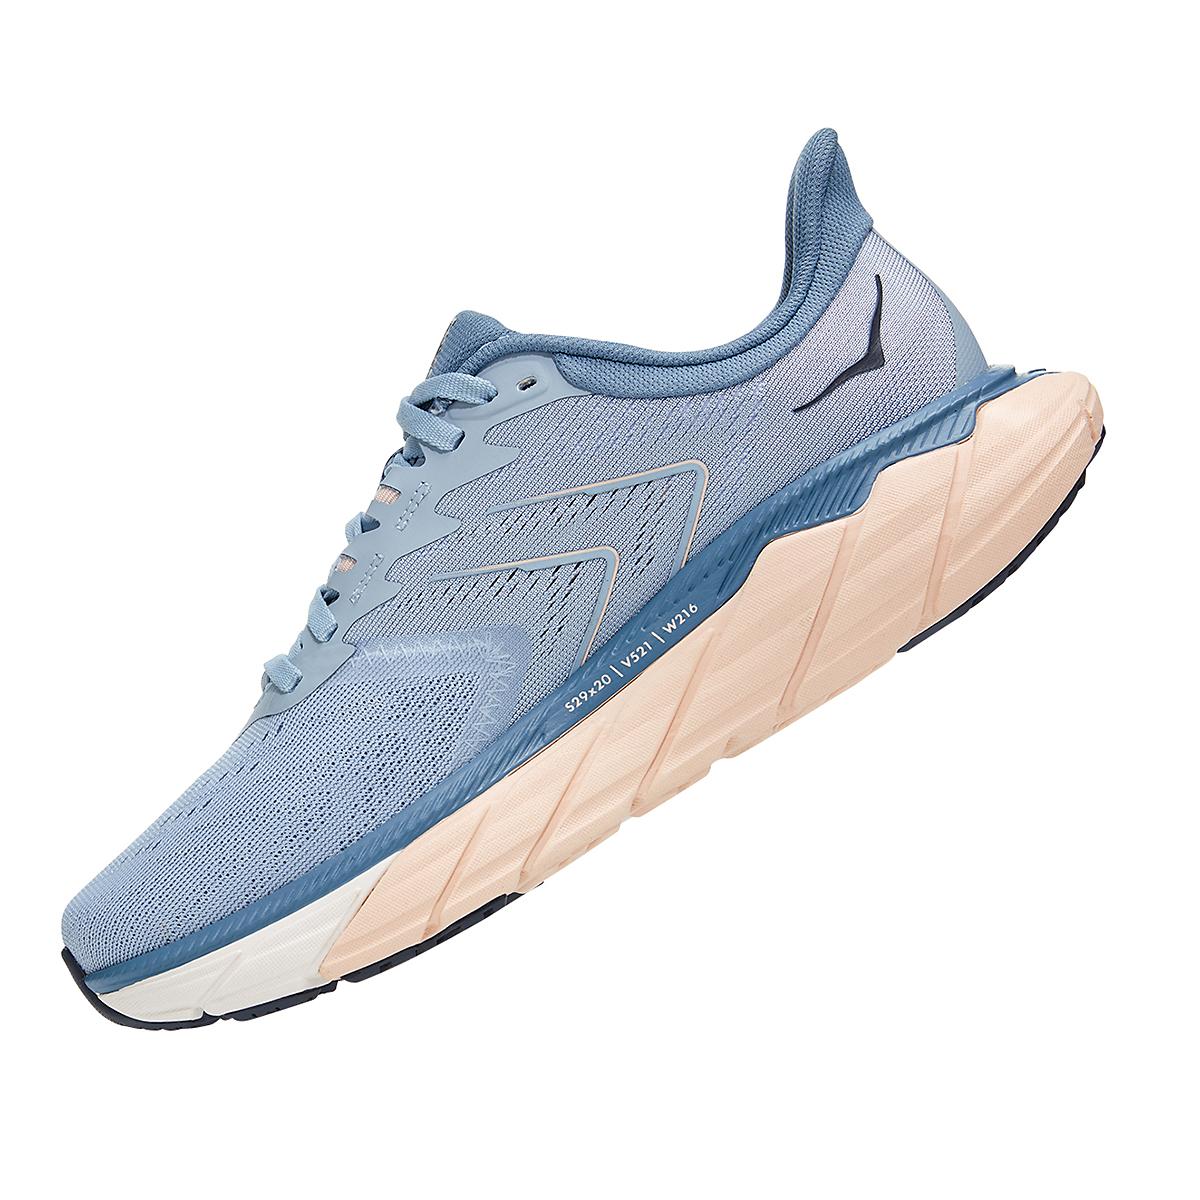 Women's Hoka One One Arahi 5 Running Shoe - Color: Blue Fog/Provincial Blue - Size: 5 - Width: Regular, Blue Fog/Provincial Blue, large, image 4